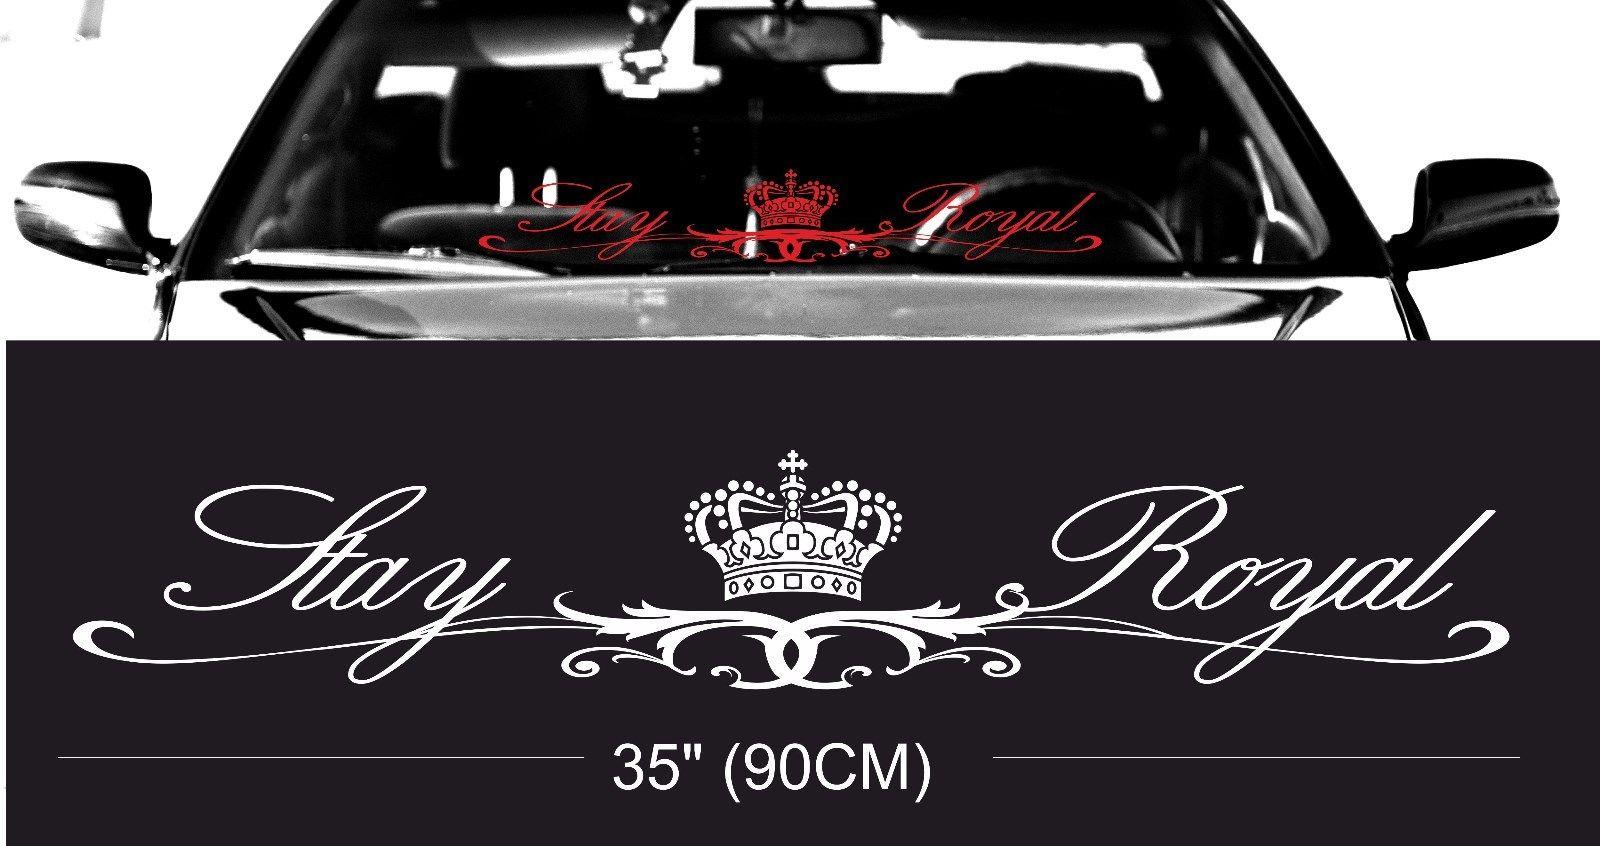 Car glass sticker design - Royal Stay Royal Windshield Windscreen Front Glass Car Jdm Decal Sticker China Mainland